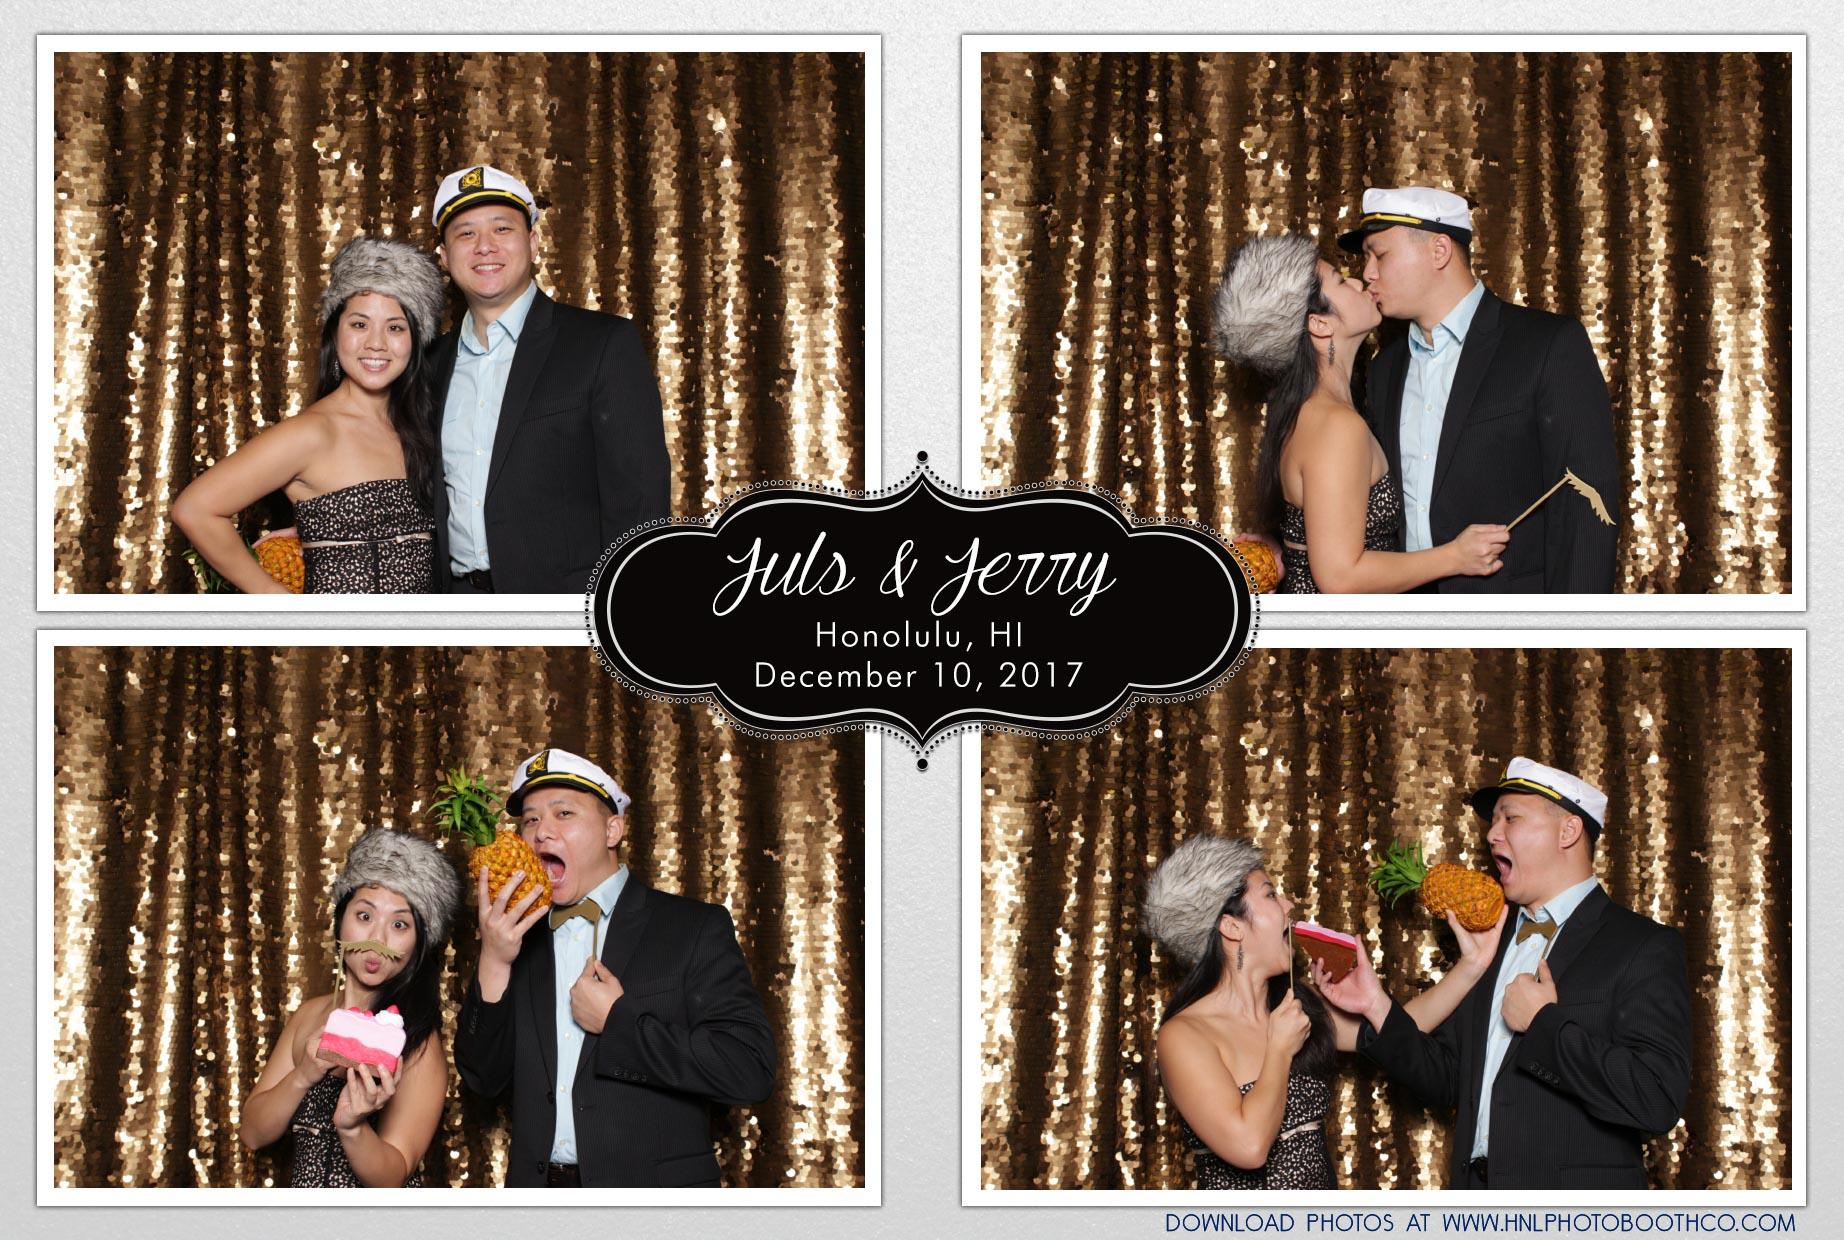 Juls and Jerry Wedding Historic Hickam Officers Club Honolulu Oahu Hawaii (9 of 45).jpg